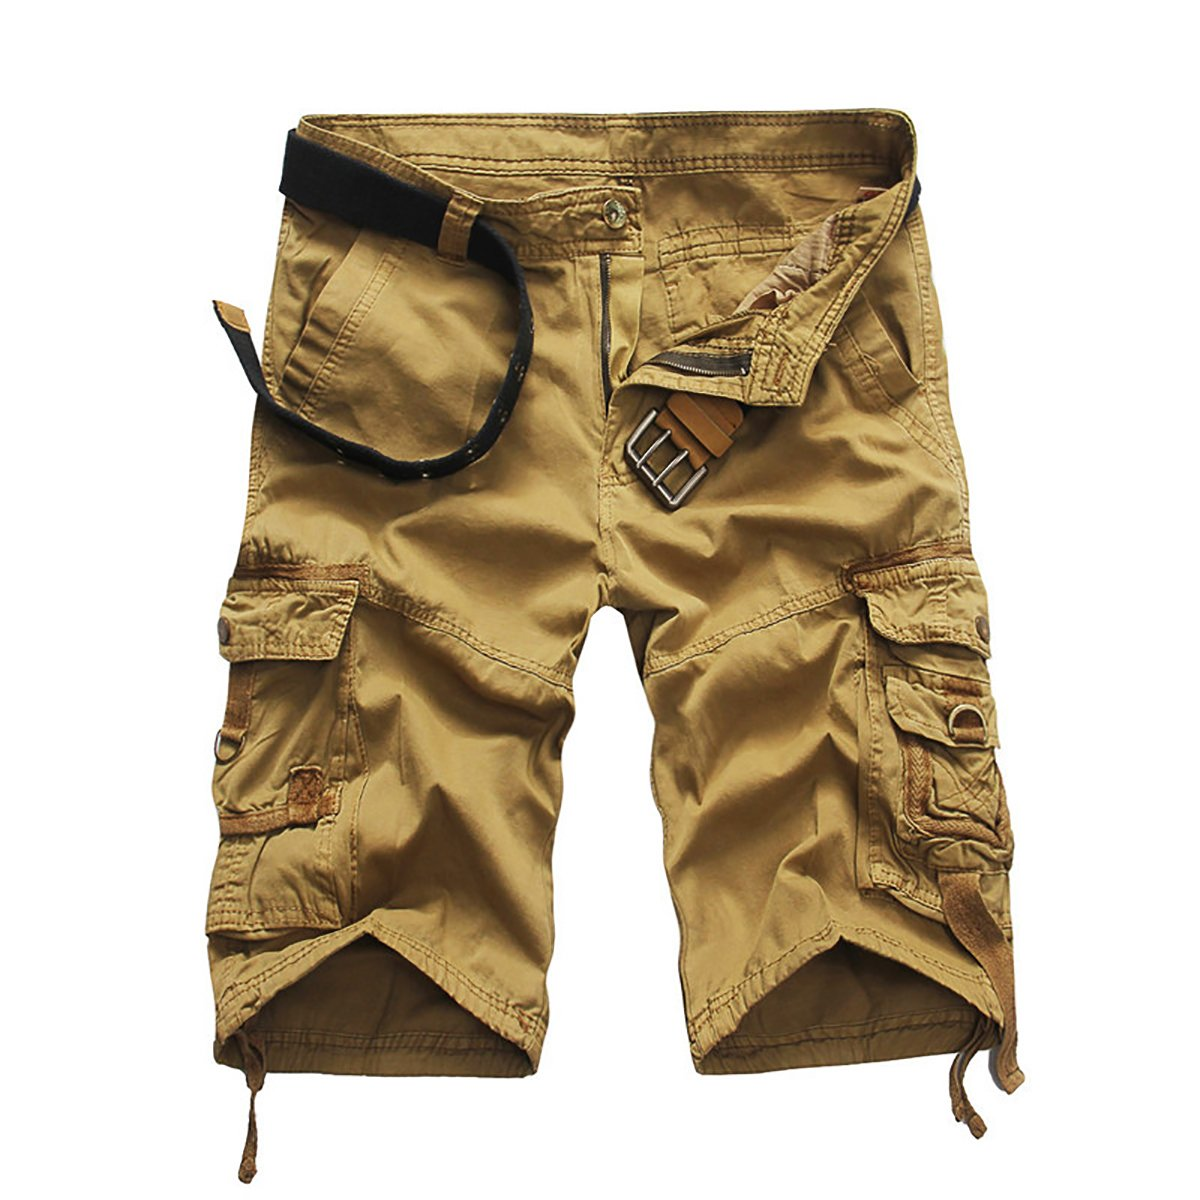 GARMOY Men's Cargo Shorts Camouflage Multi Pockets Twill Fit Breathable Summer Loose Outdoor Shorts Khaki-32